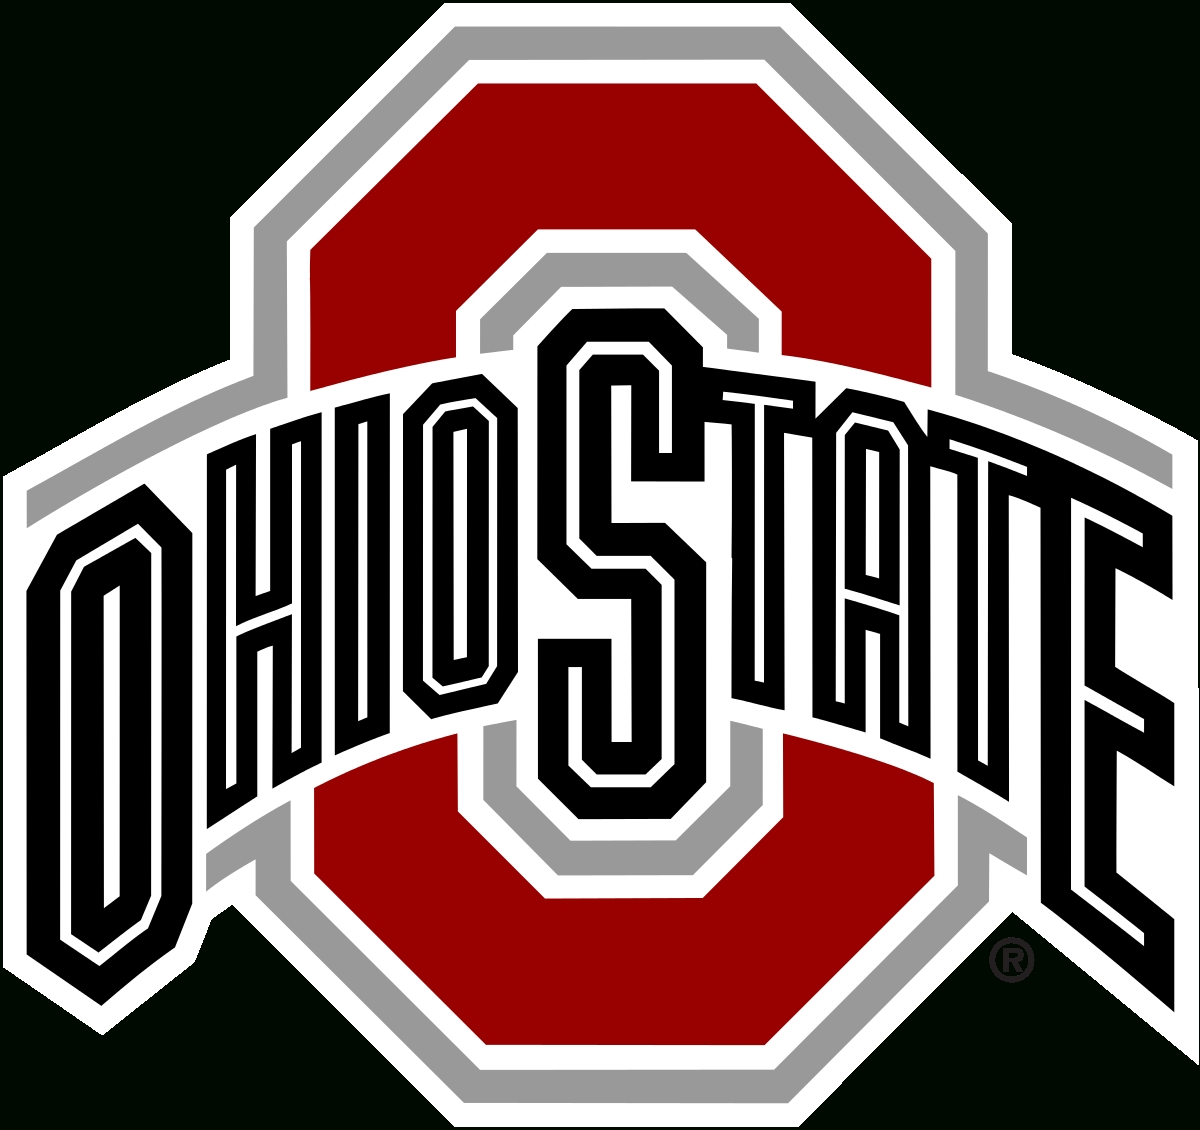 2007 ohio state buckeyes football team - wikipedia